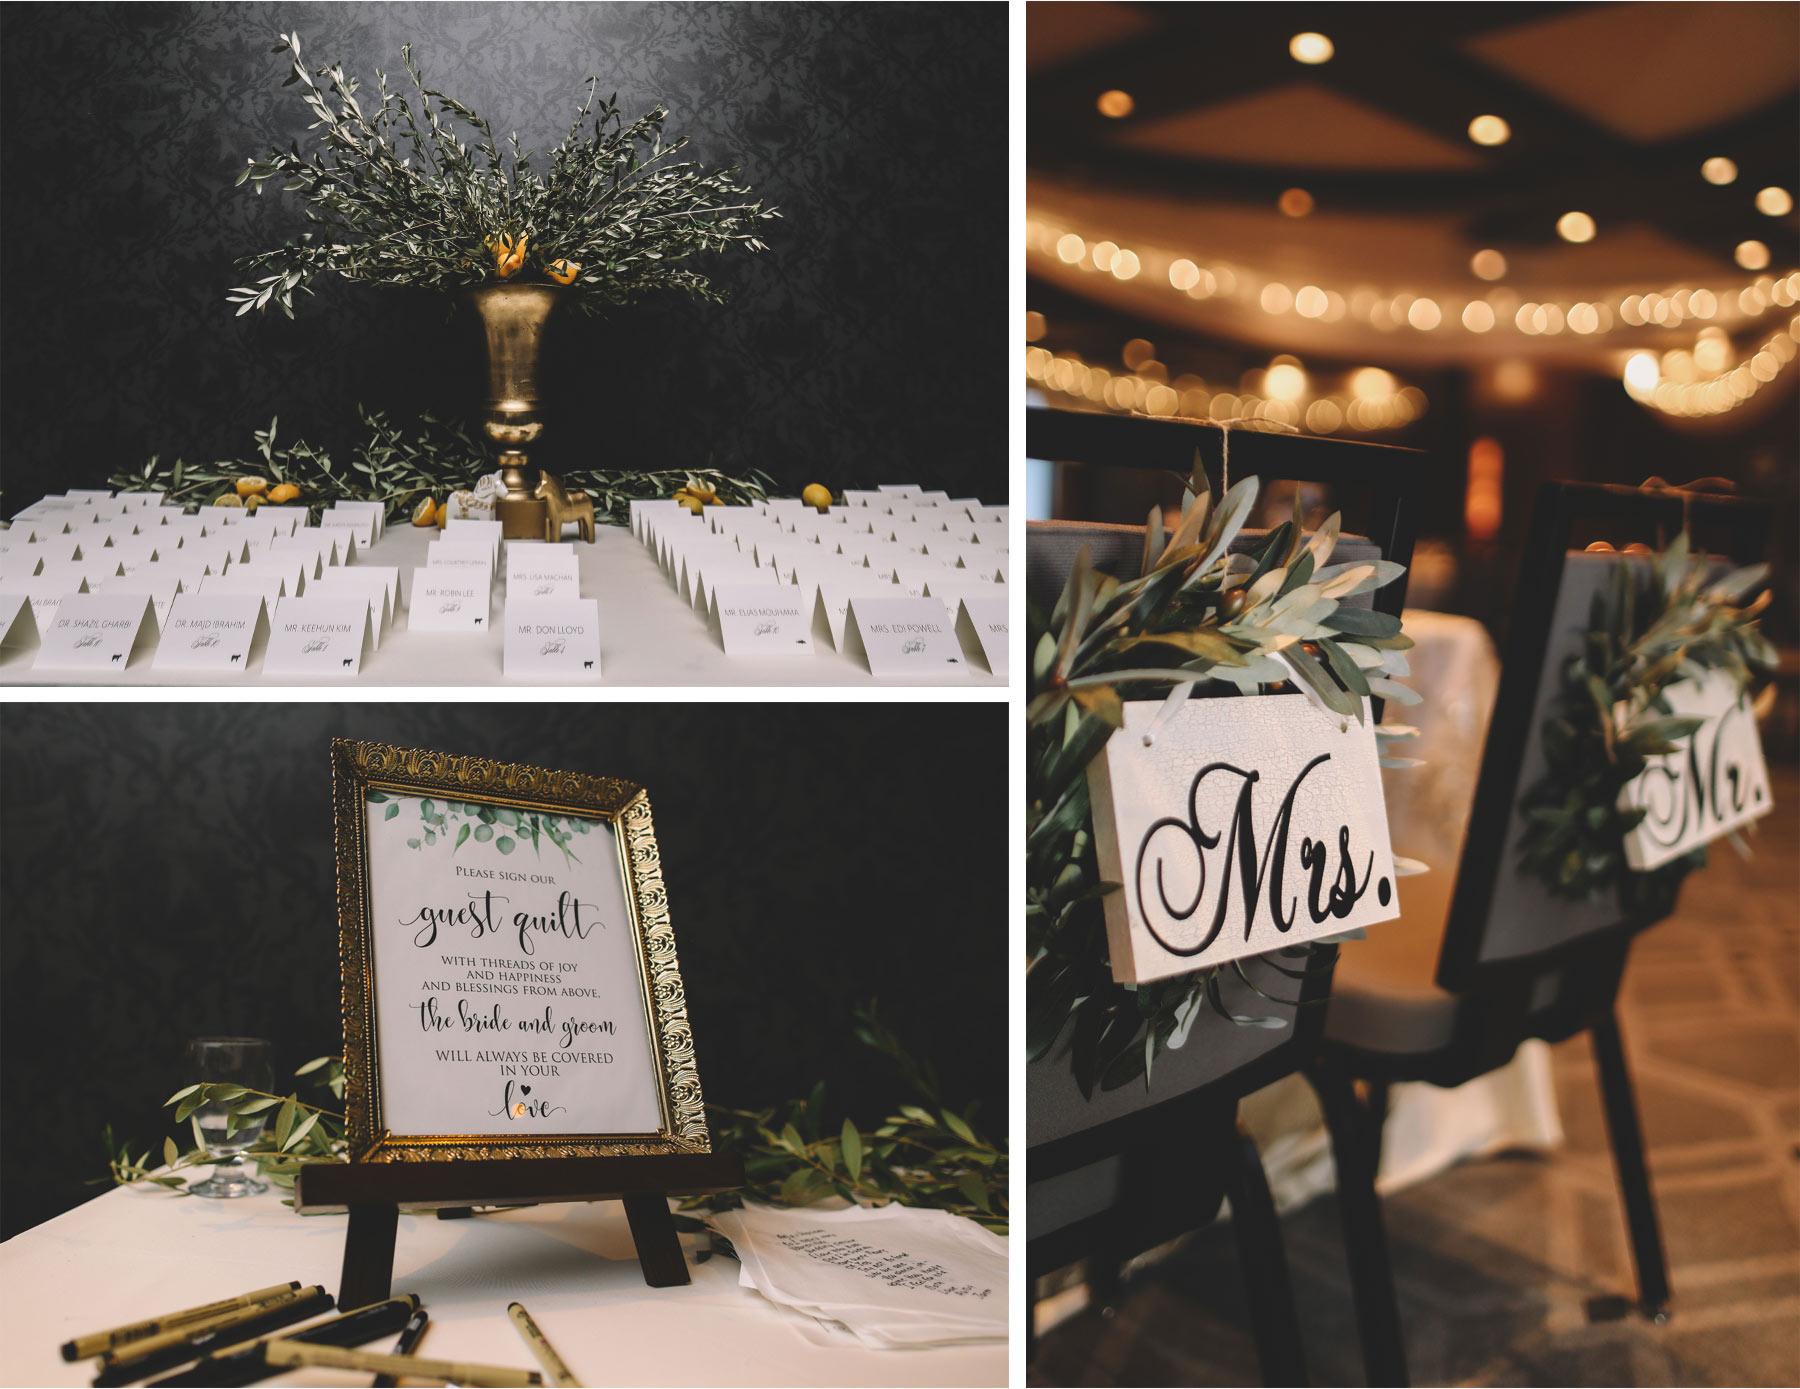 13-Minneapolis-Minnesota-Wedding-Photography-by-Vick-Photography-Downtown-Windows-on-Minnesota-Reception-Place-Setting-Anja-and-Waseem.jpg